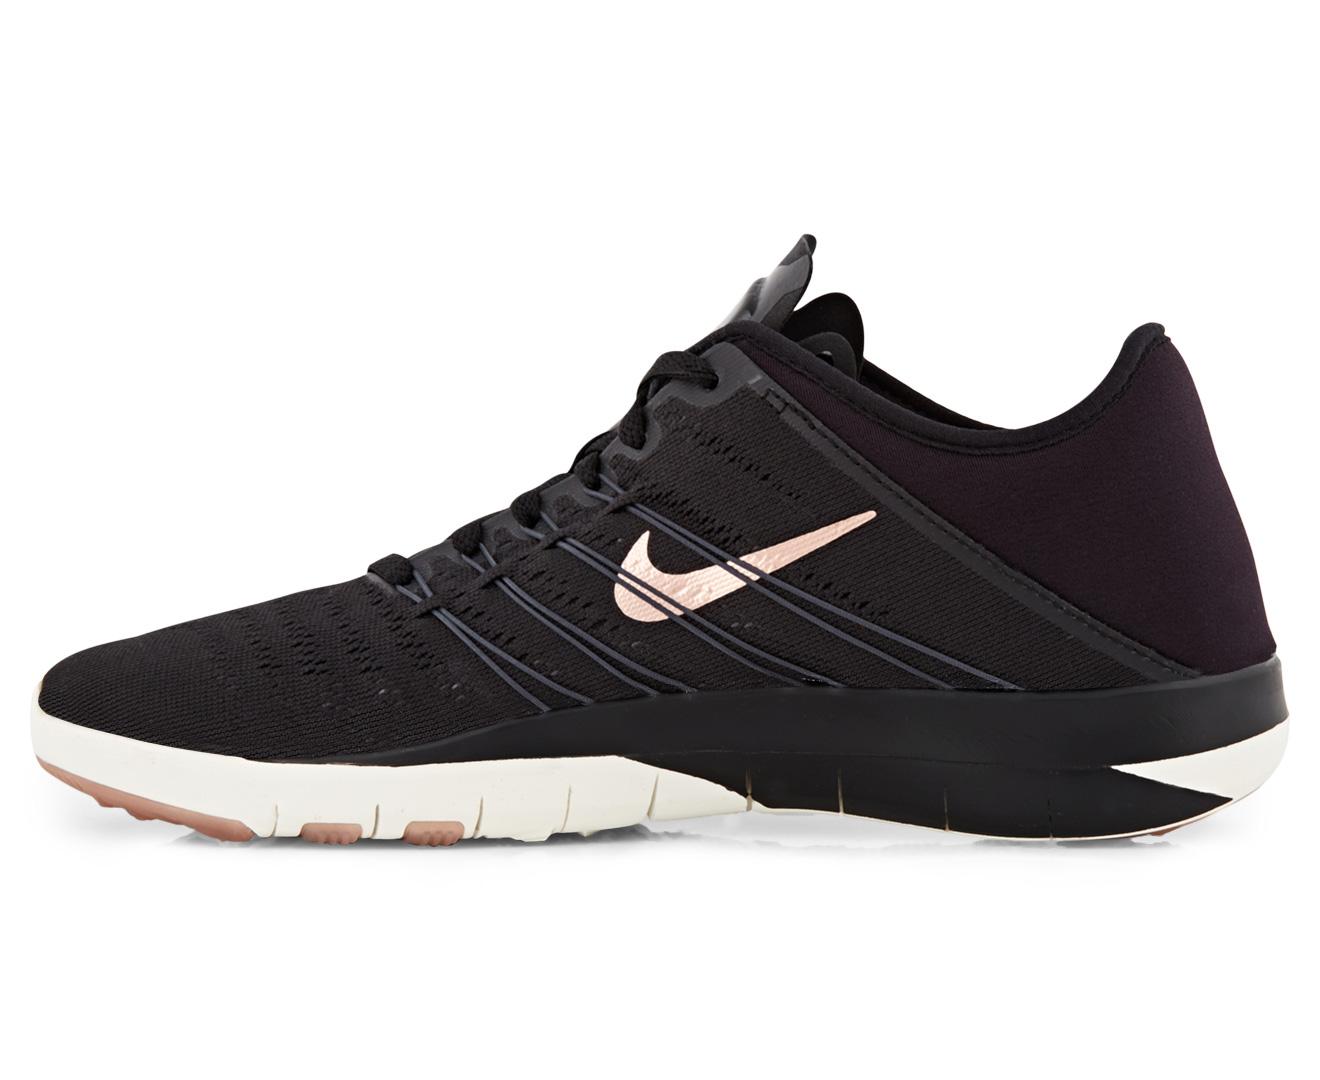 wholesale dealer 3589b de981 Nike Women s Free TR 6 Shoe - Black Metallic Red Bronze   Catch.com.au